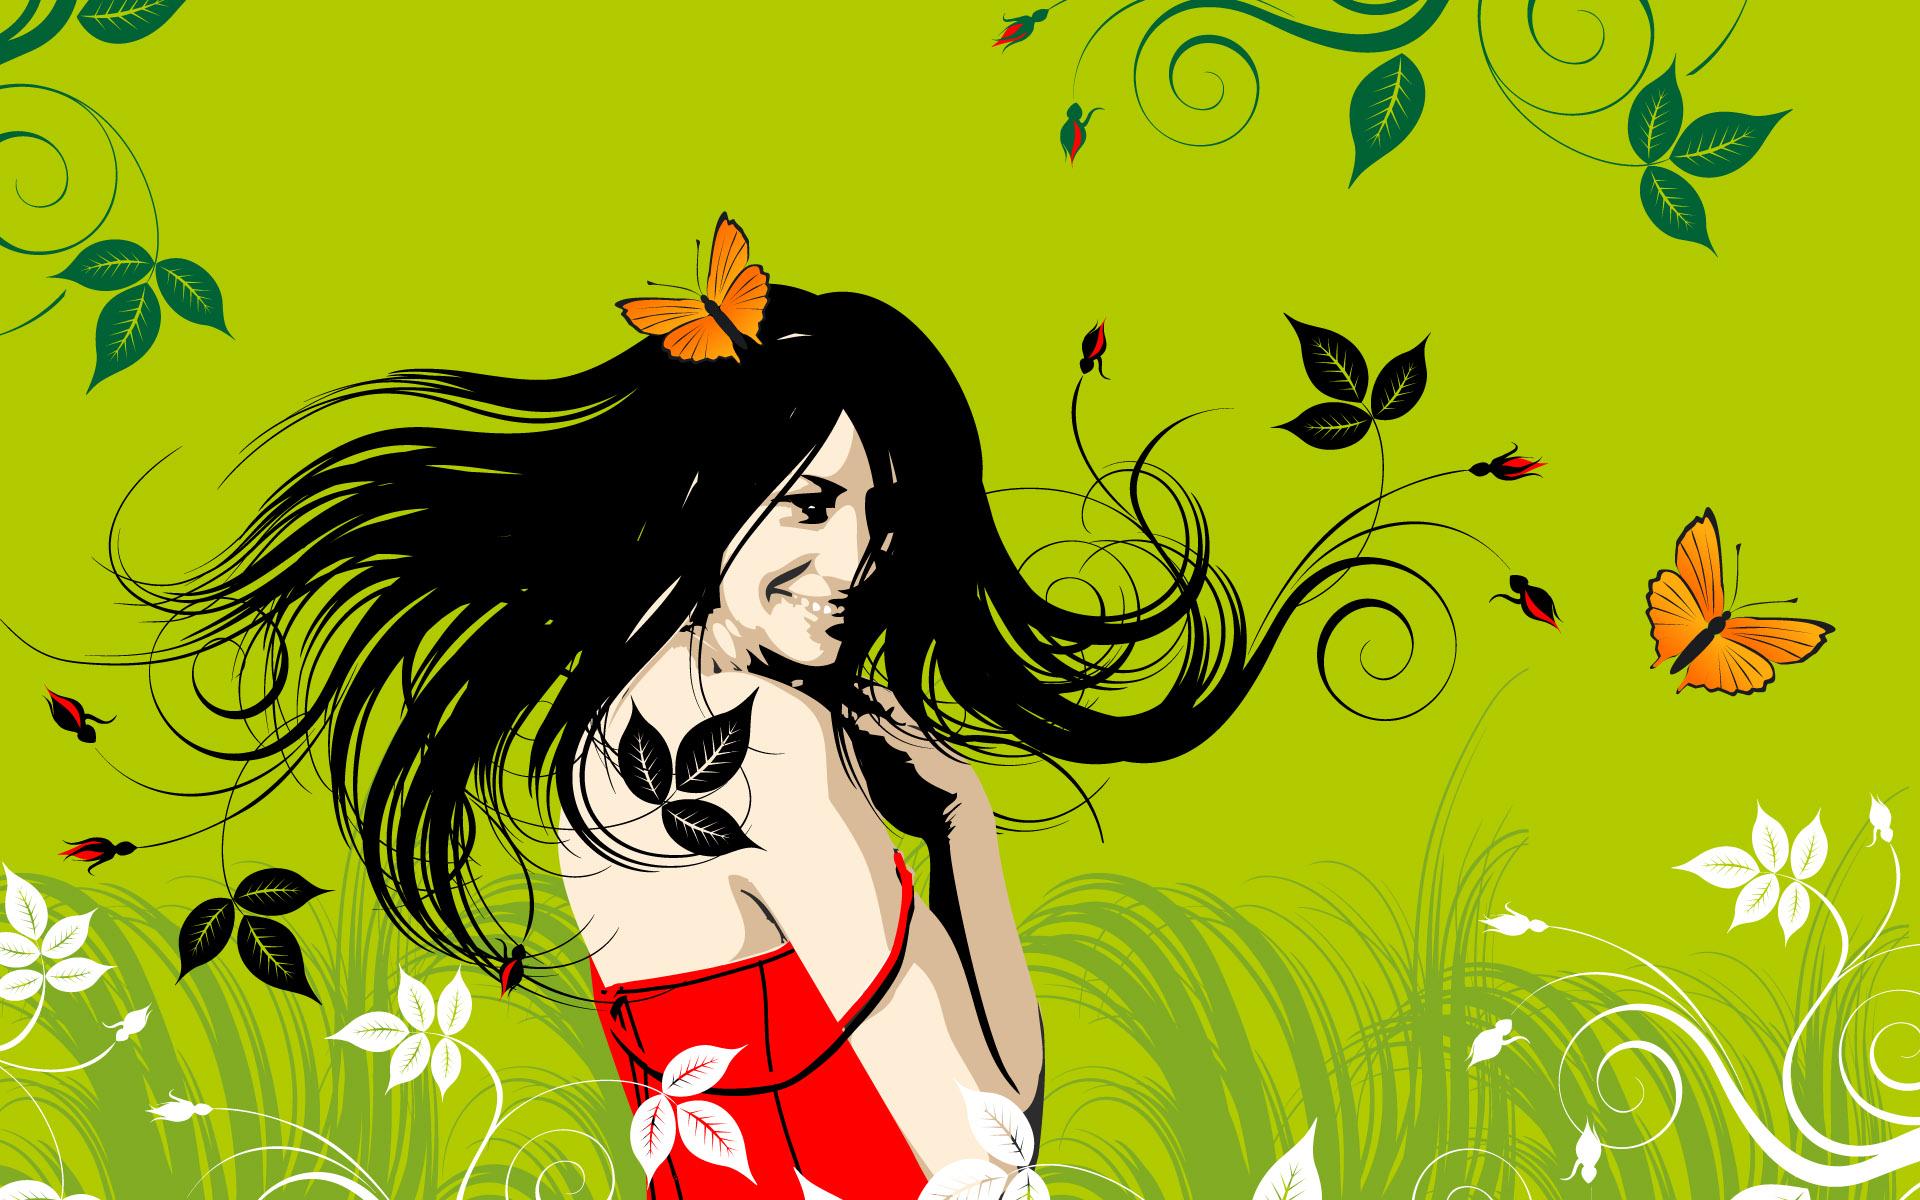 International_Womens_Day_Festival_International_Women_s_Day_014527_